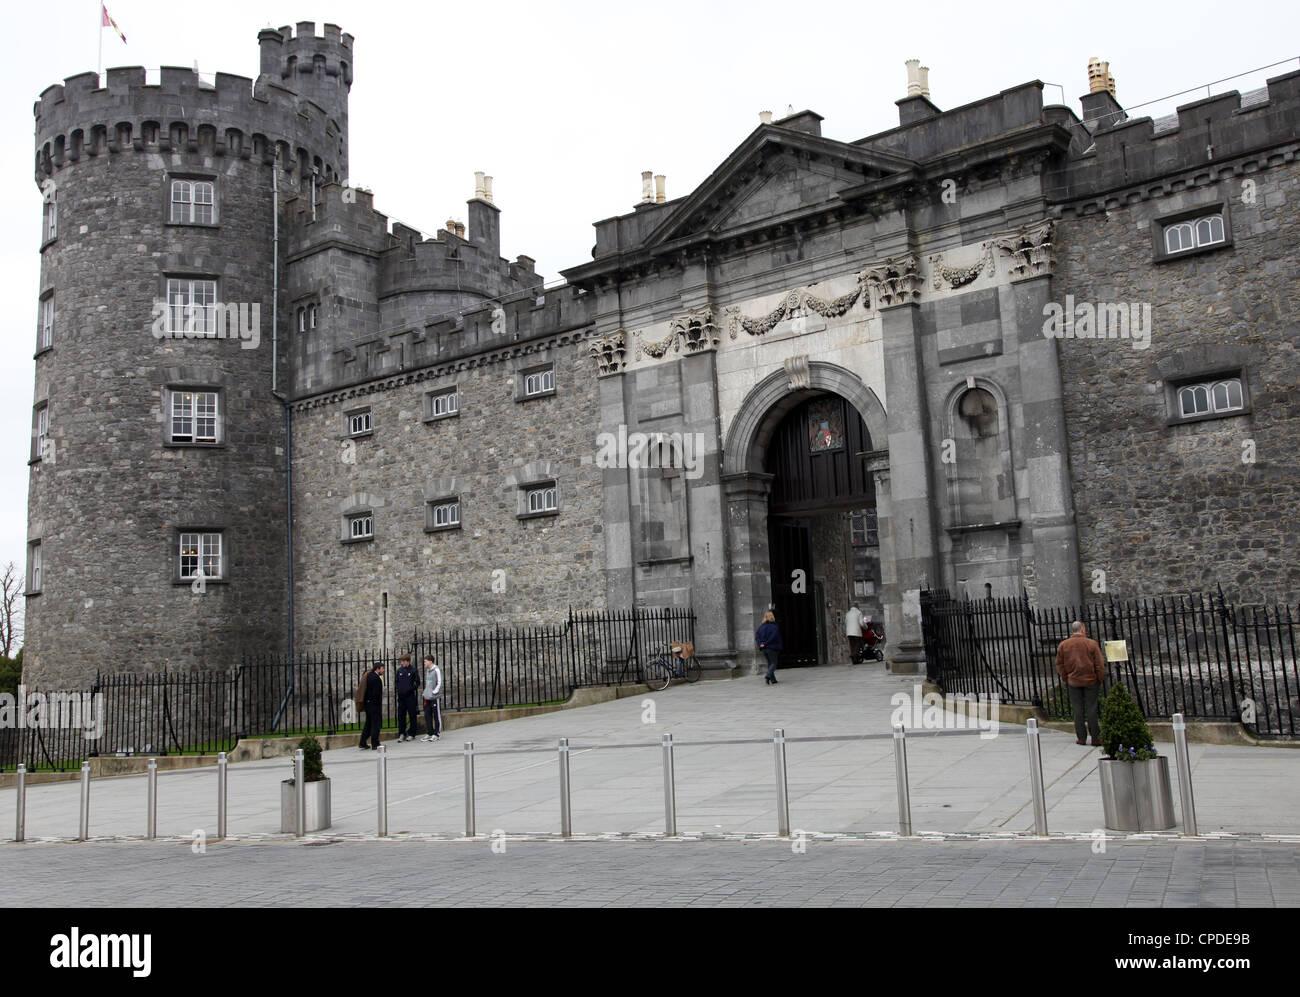 Kilkenny castle, County Kilkenny, Leinster, Republic of Ireland, Europe - Stock Image